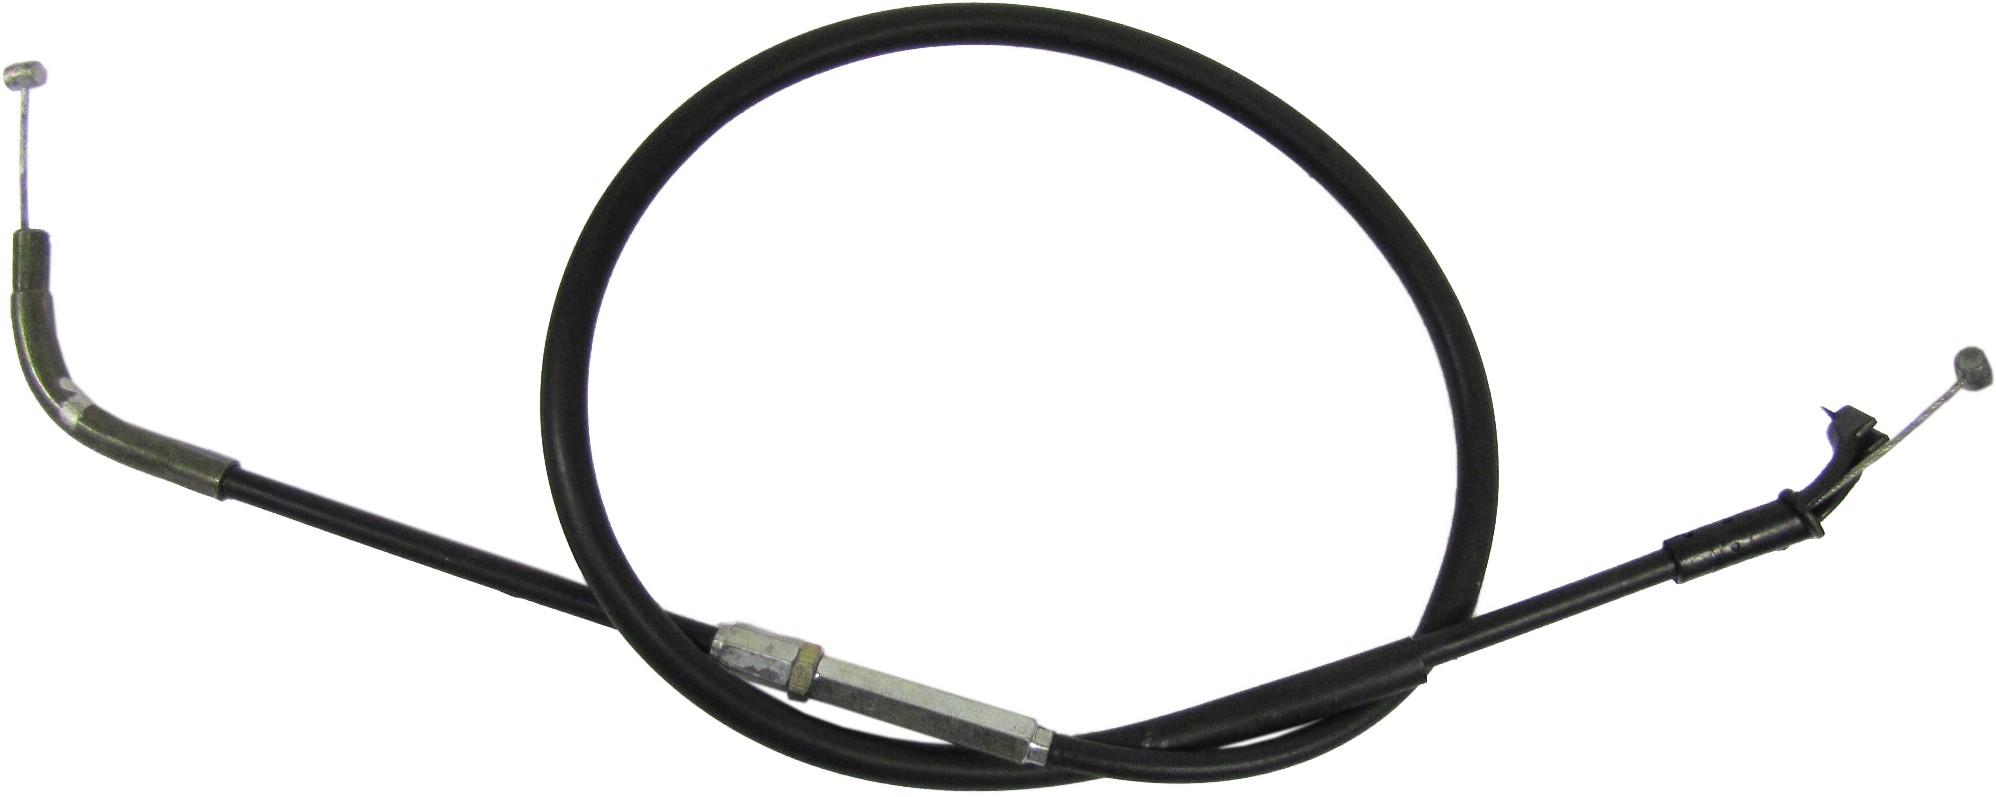 54017-1188 1997-2000 Choke Cable ER500A Kawasaki ER-5 Each